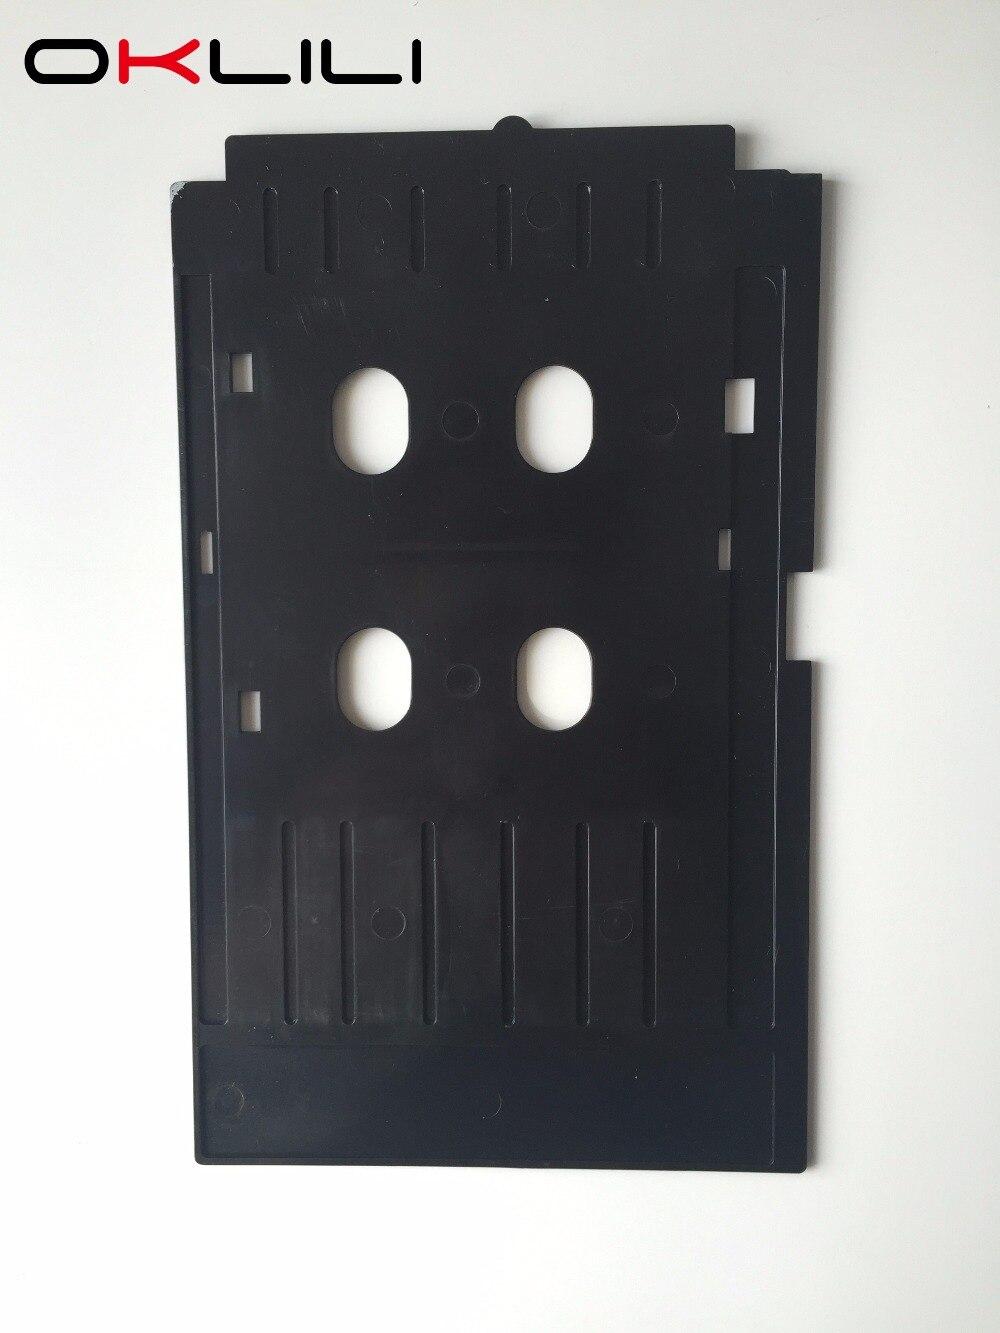 cheapest PVC ID Card Tray Plastic card Printing Tray for Epson R260 R265 R270 R280 R290 R380 R390 RX680 T50 T60 A50 P50 L800 L801 R330